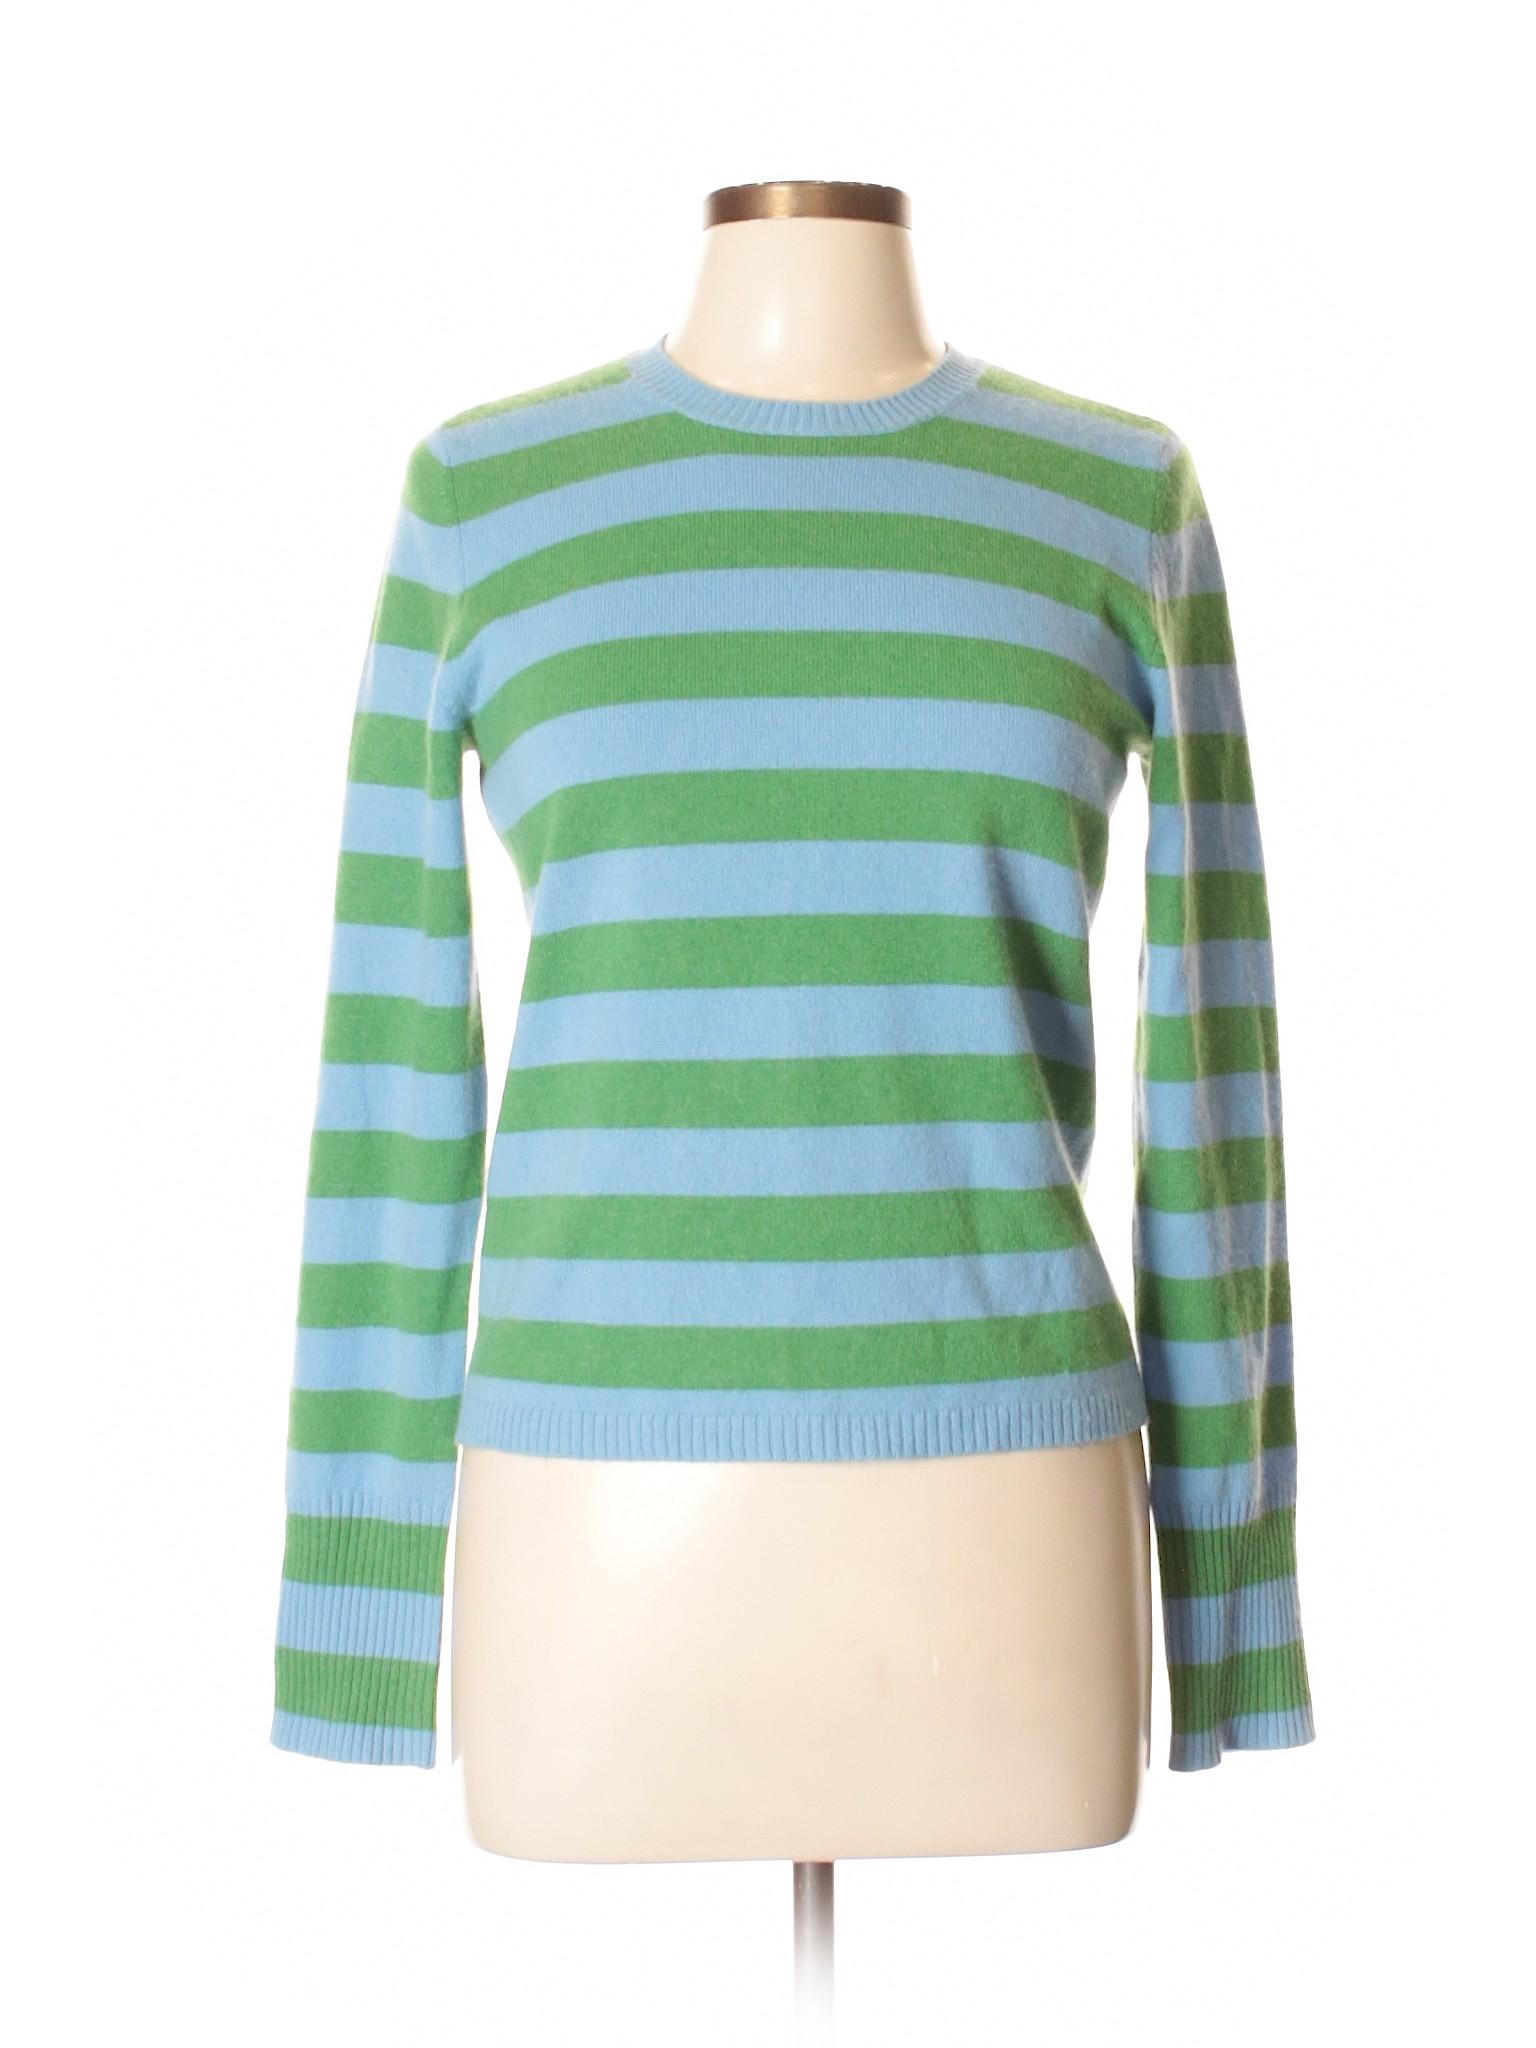 Boutique Pullover White Warren Cashmere winter Sweater wxZTfAq